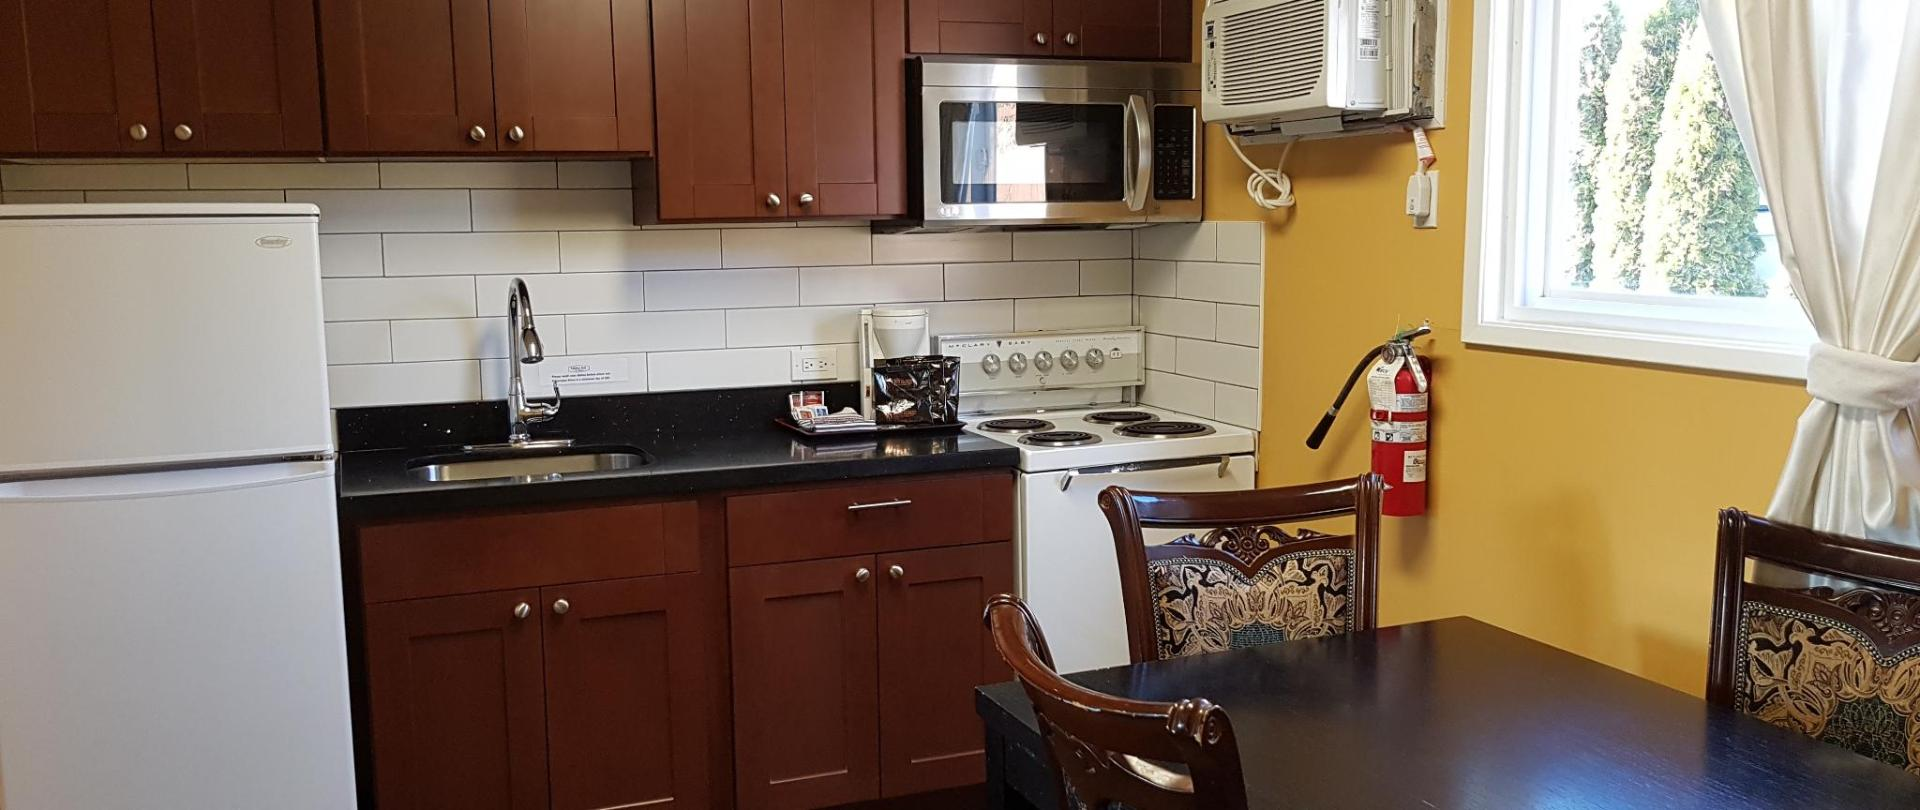 One Bedroom Kitchen Suite - Kitchen 1.jpg